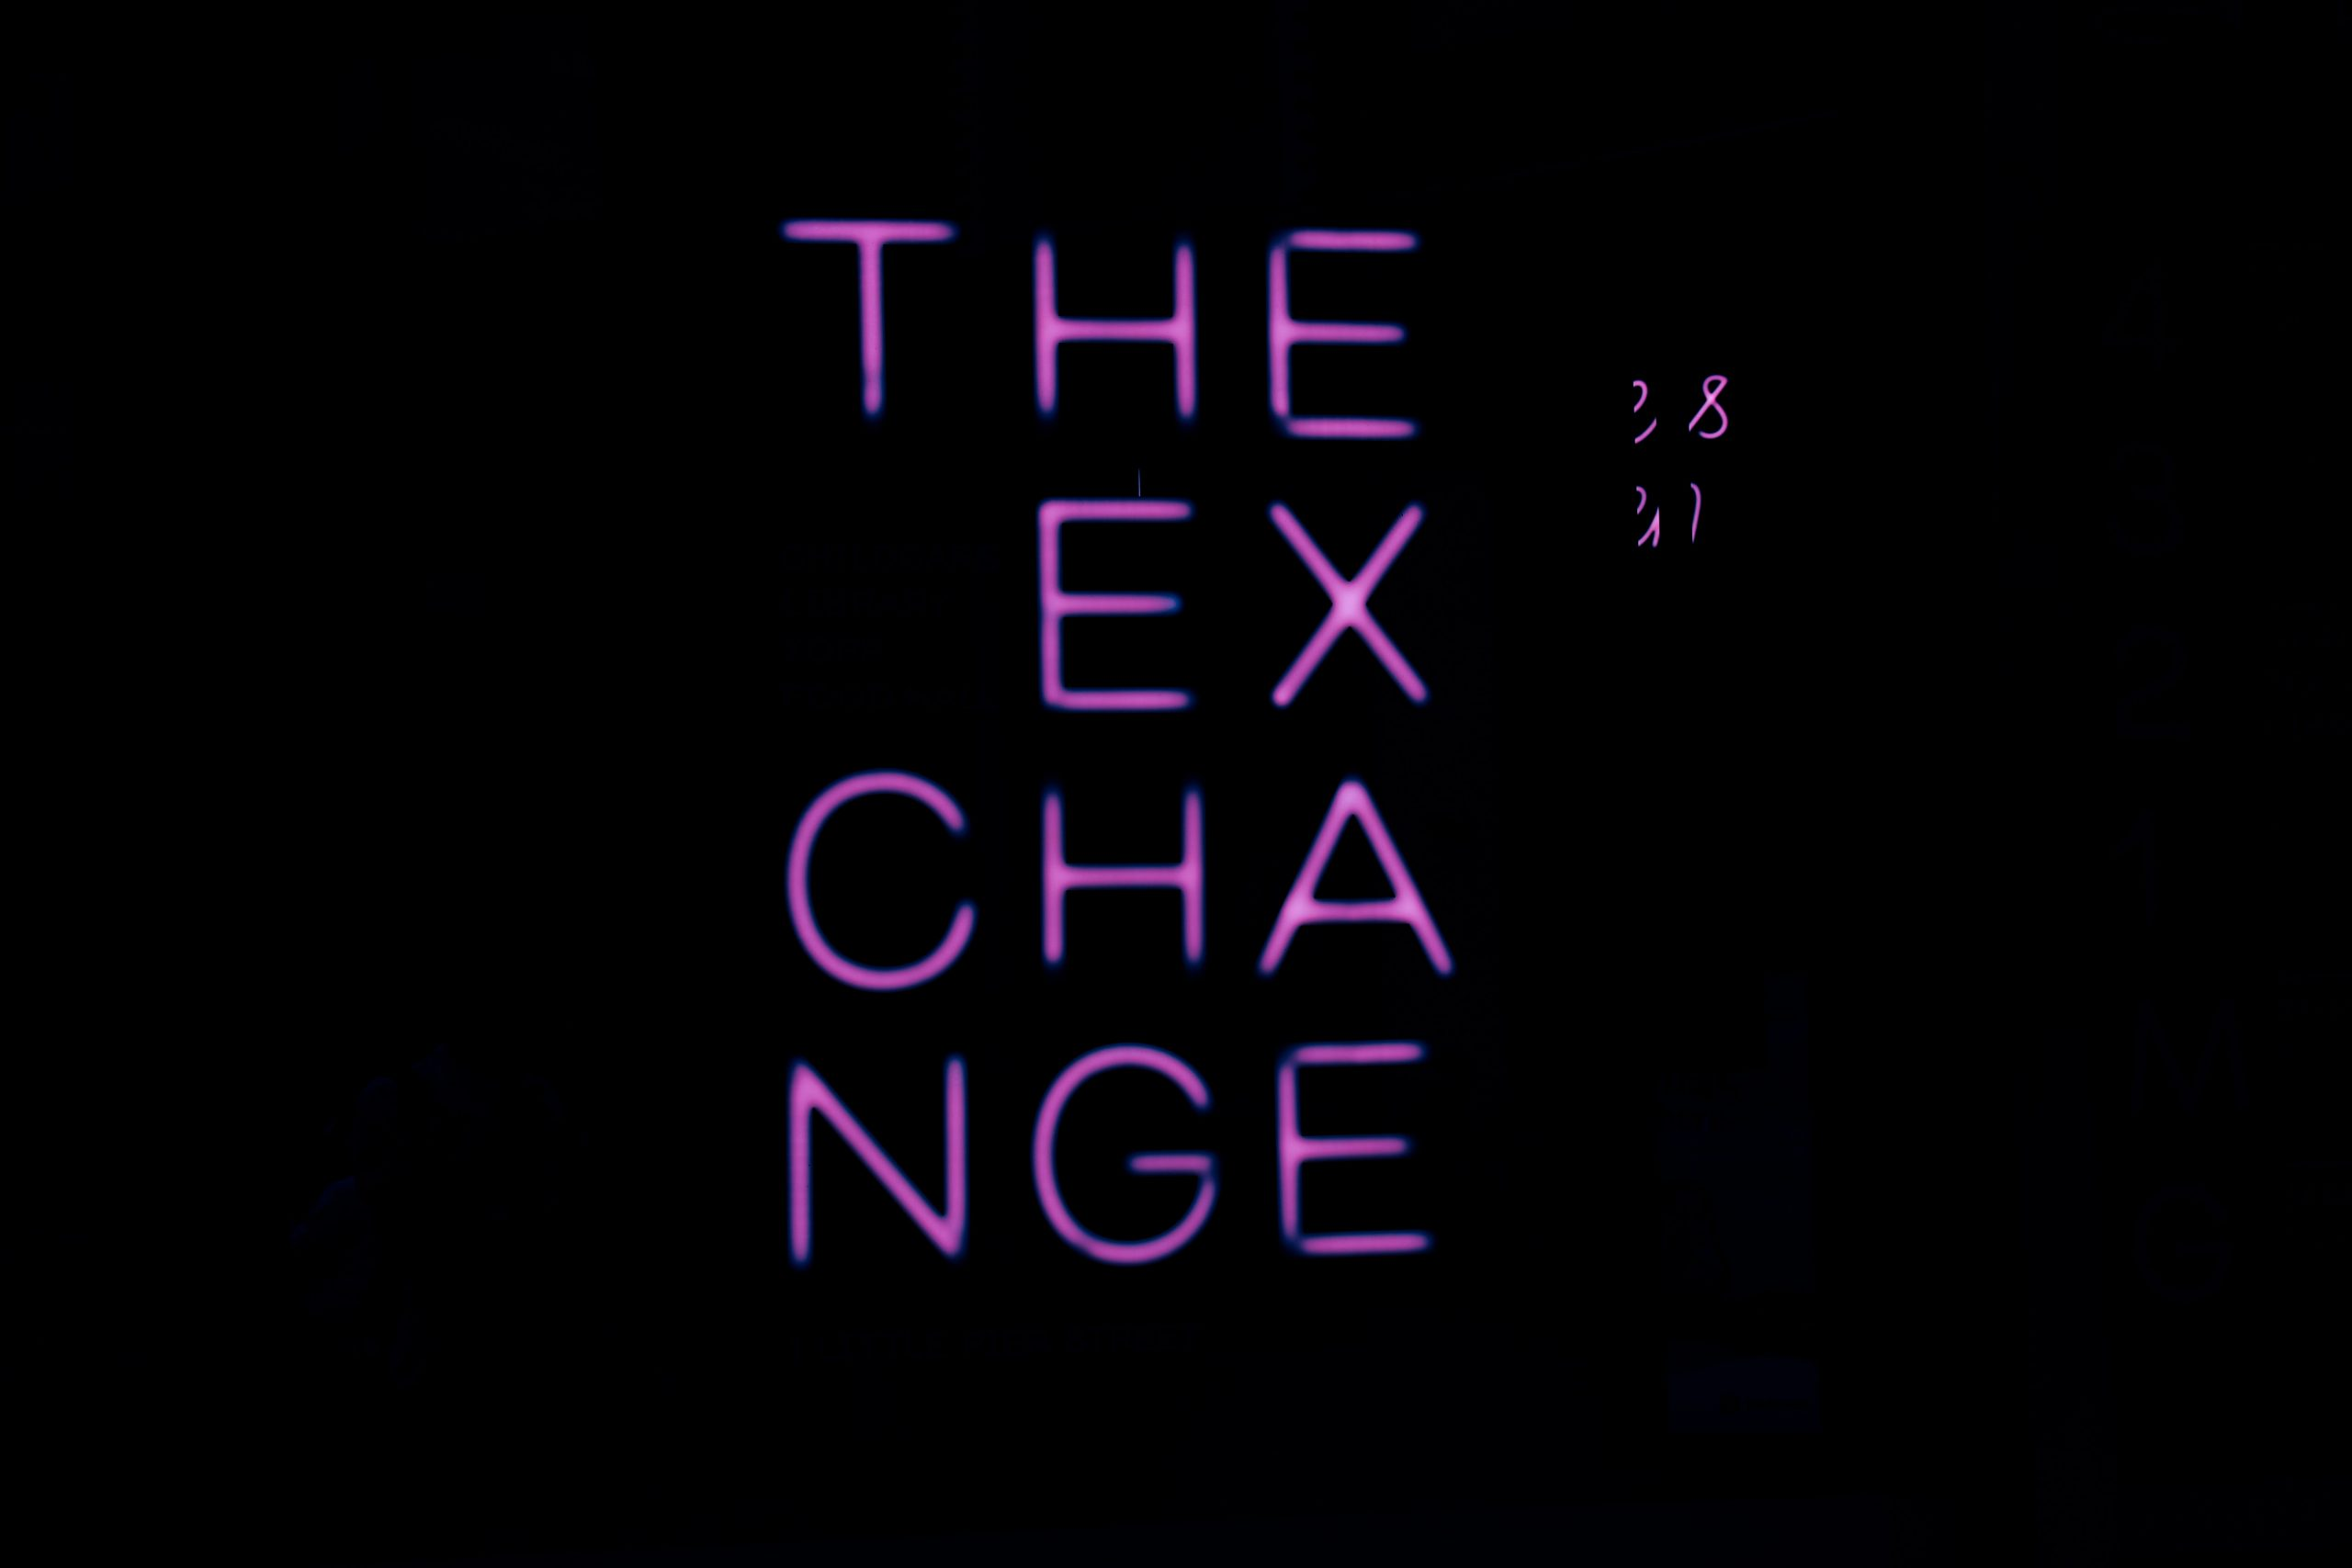 MS Exchange zraniteľnosť